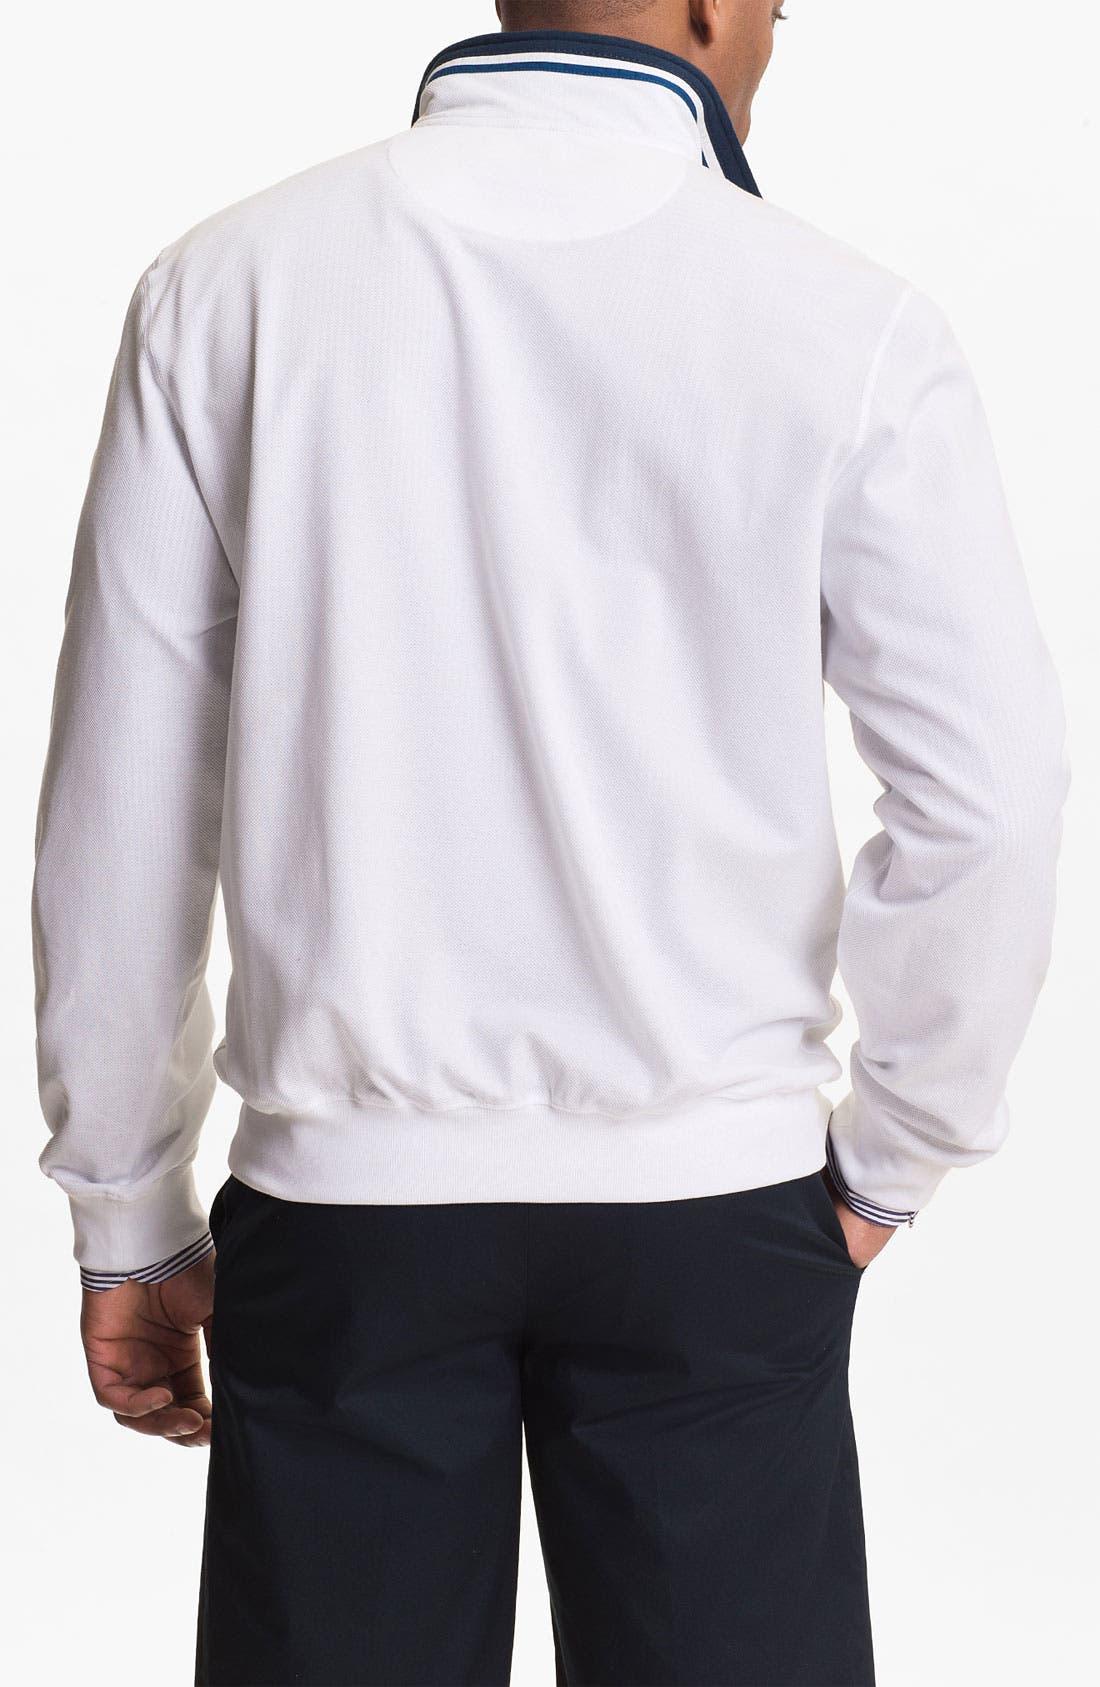 Alternate Image 2  - Paul & Shark Quarter Zip Pique Sweater